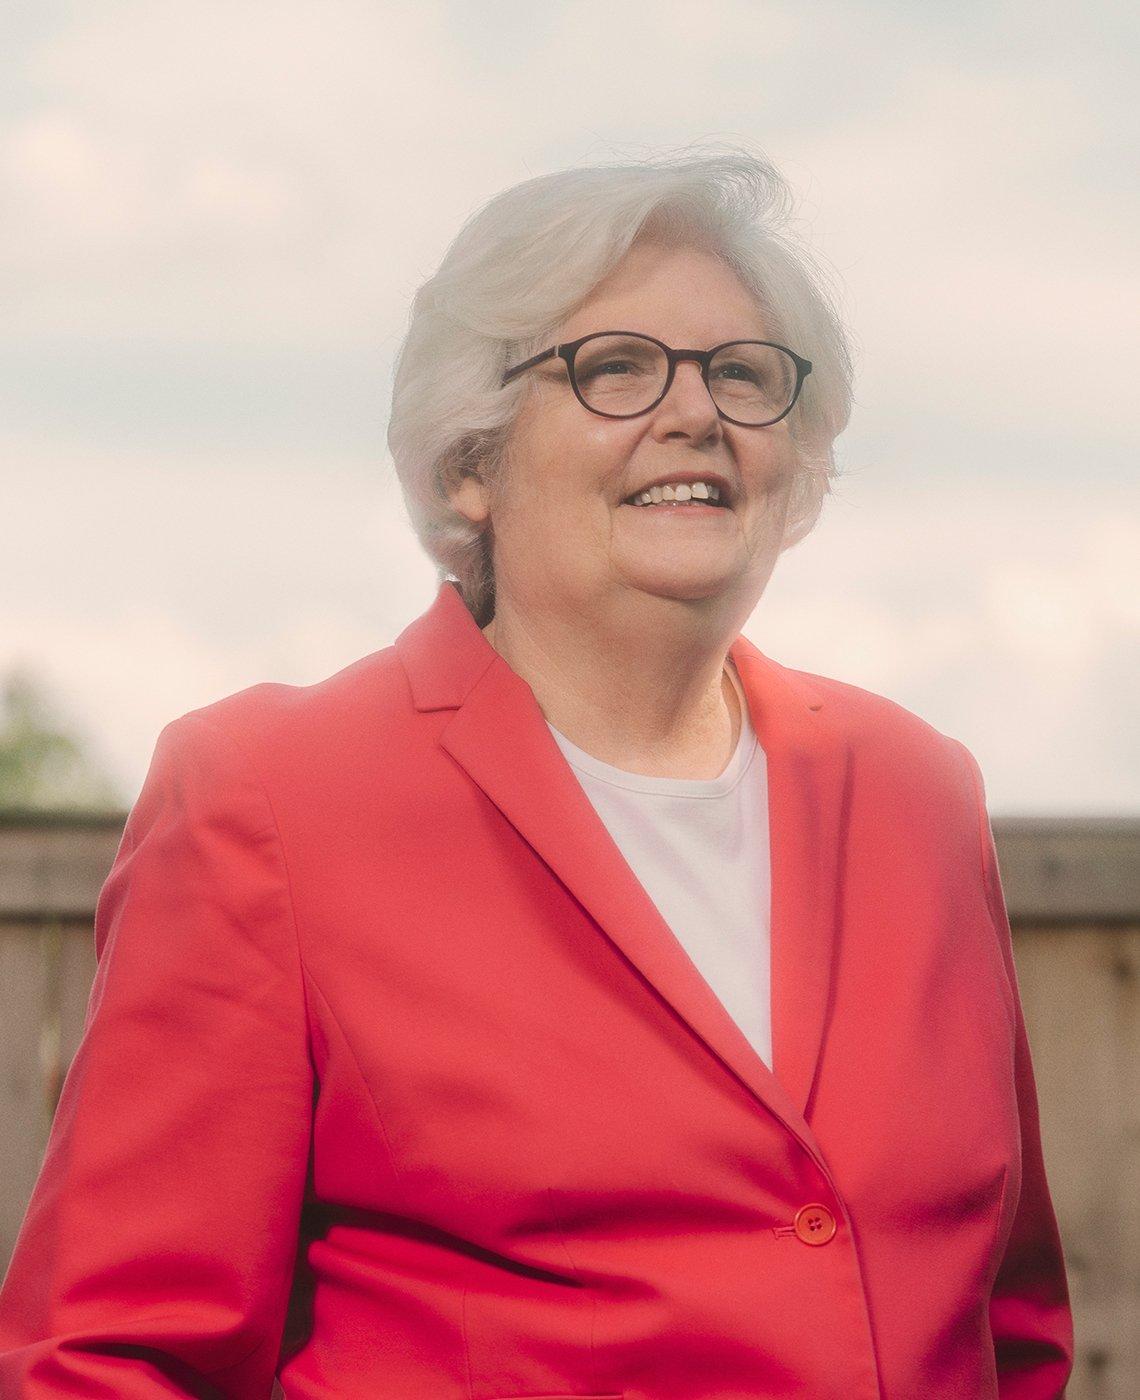 Nancy LeaMond, directora de Activismo y Compromiso de AARP.